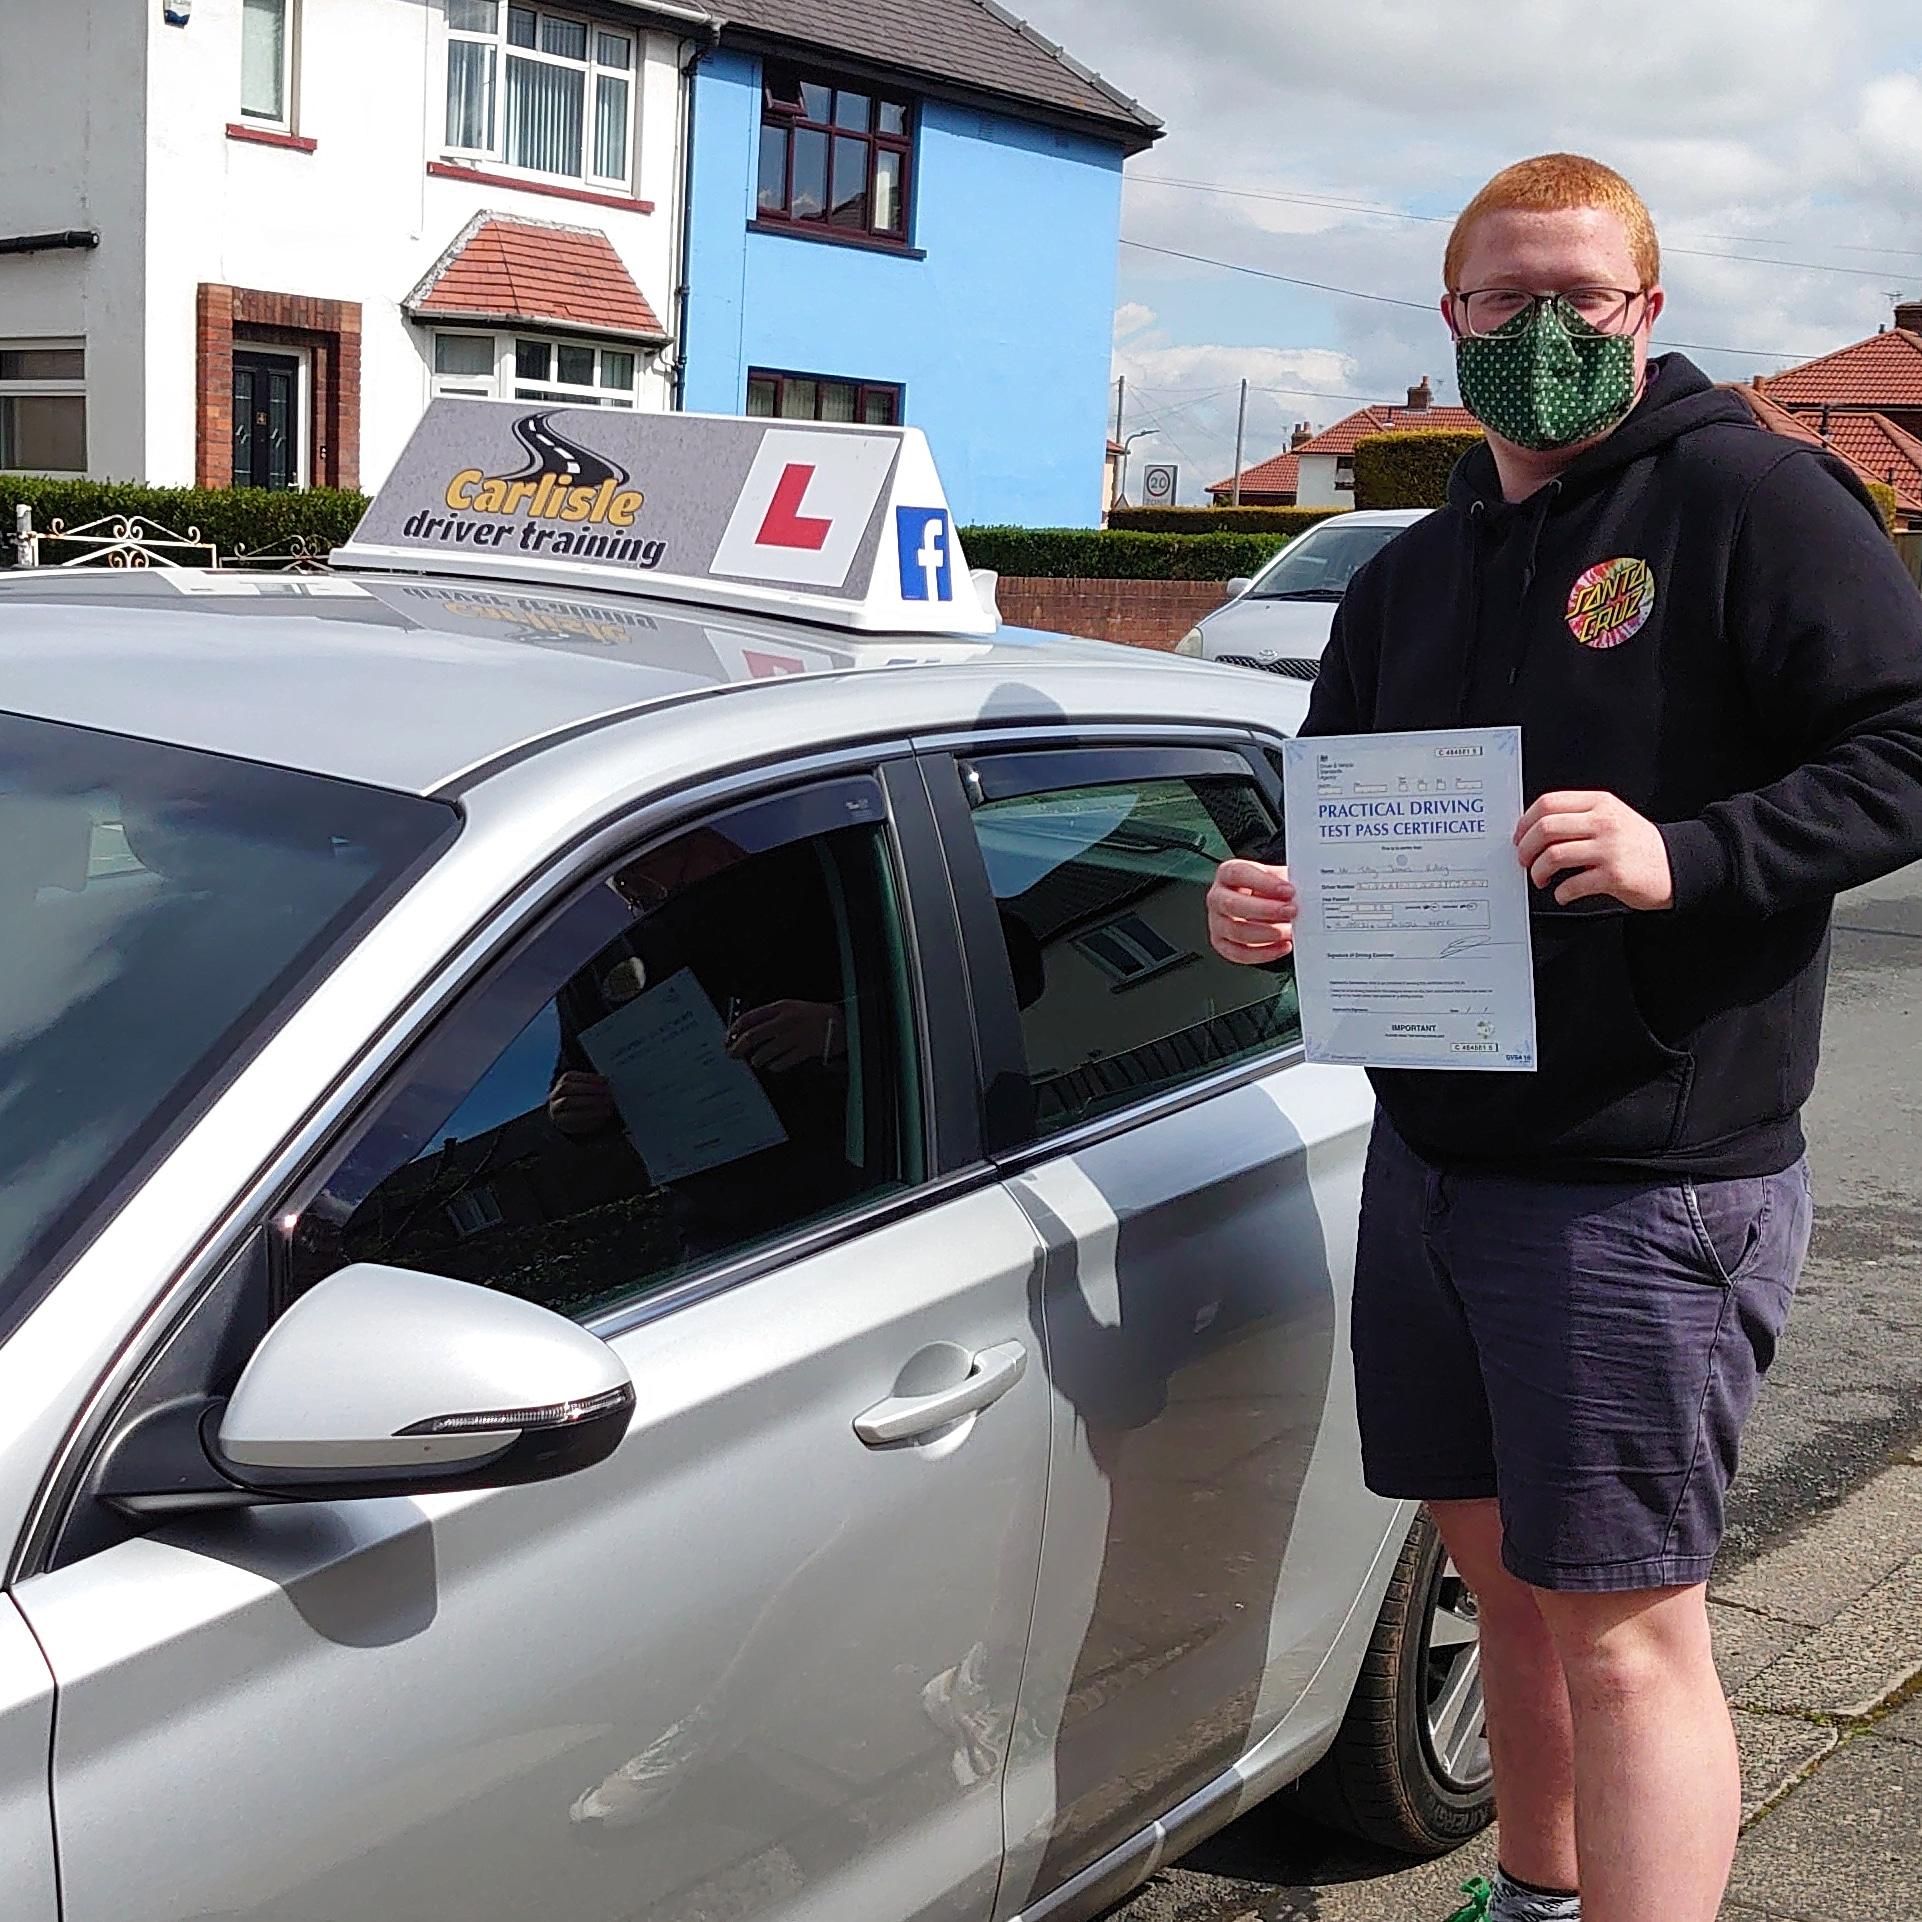 Toby Ridley, carlisle driver training, driving lessons carlisle, driving instructor carlisle, driving school carlisle, www.carlisledrivertraining.co.uk